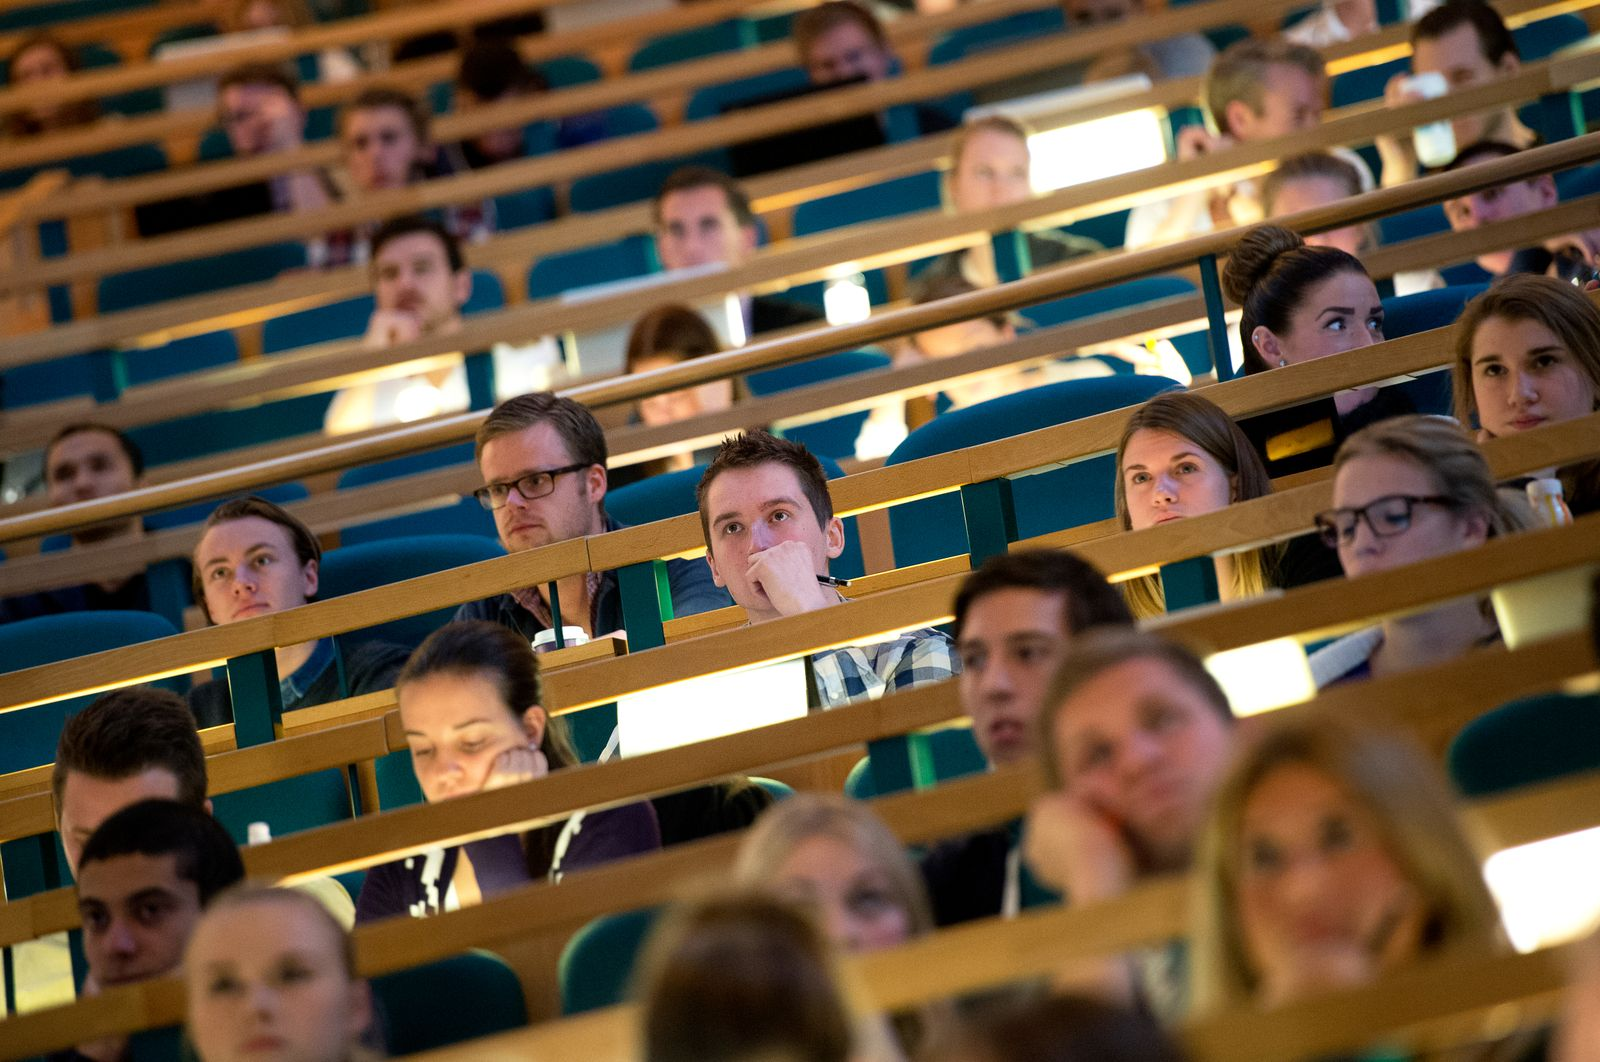 SWEDEN-THEME-EDUCATION-UNIVERSITY